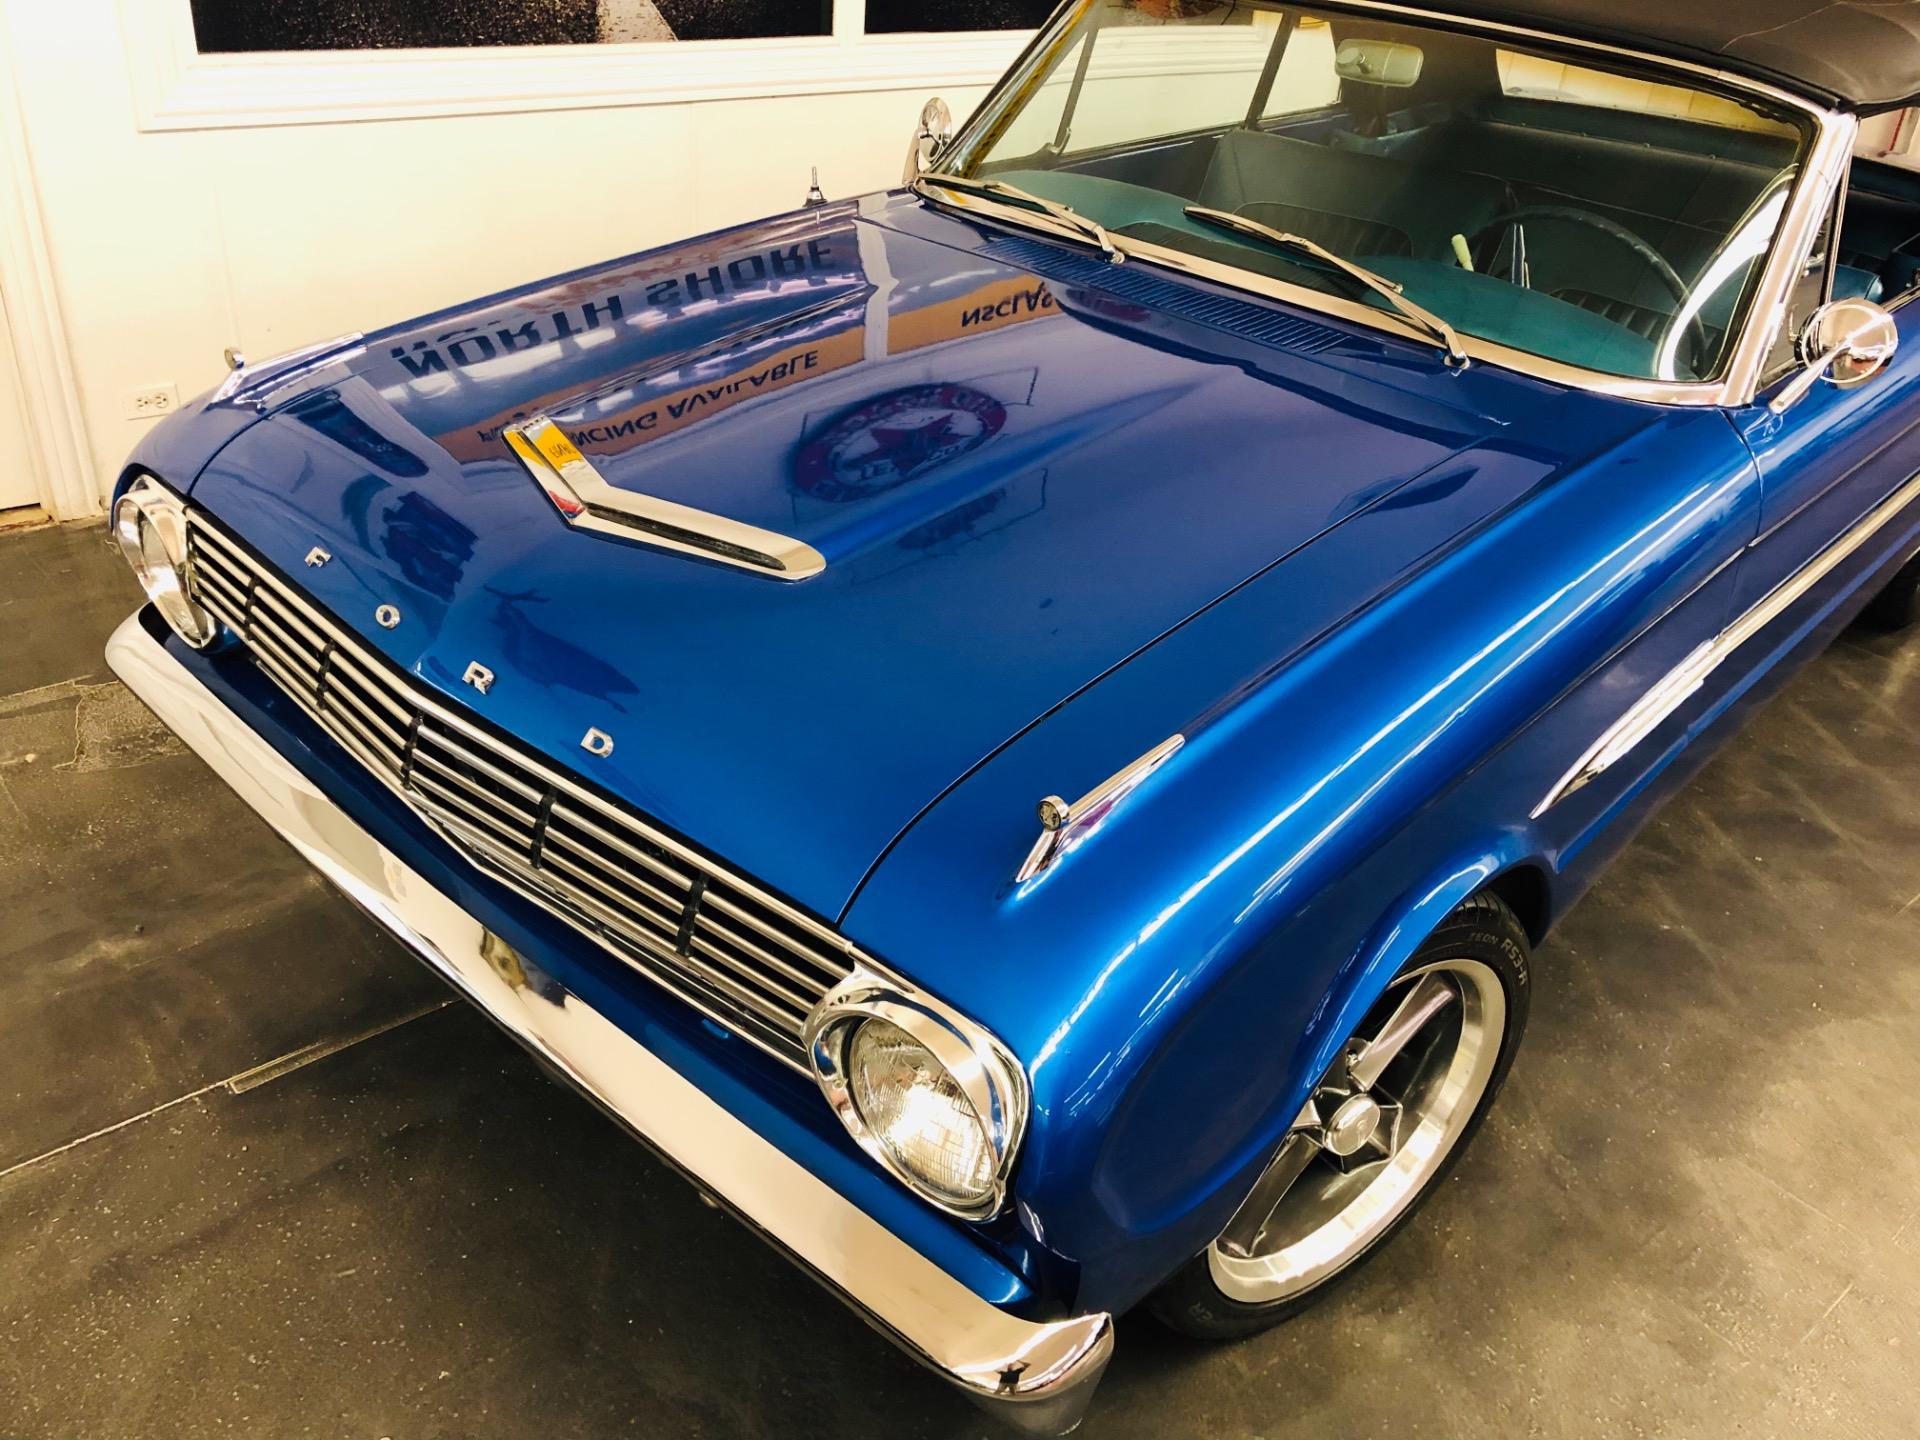 1963 Ford Falcon -FUTURA-BLUE ANGEL-4 WHEEL DISC- CONVERTIBLE